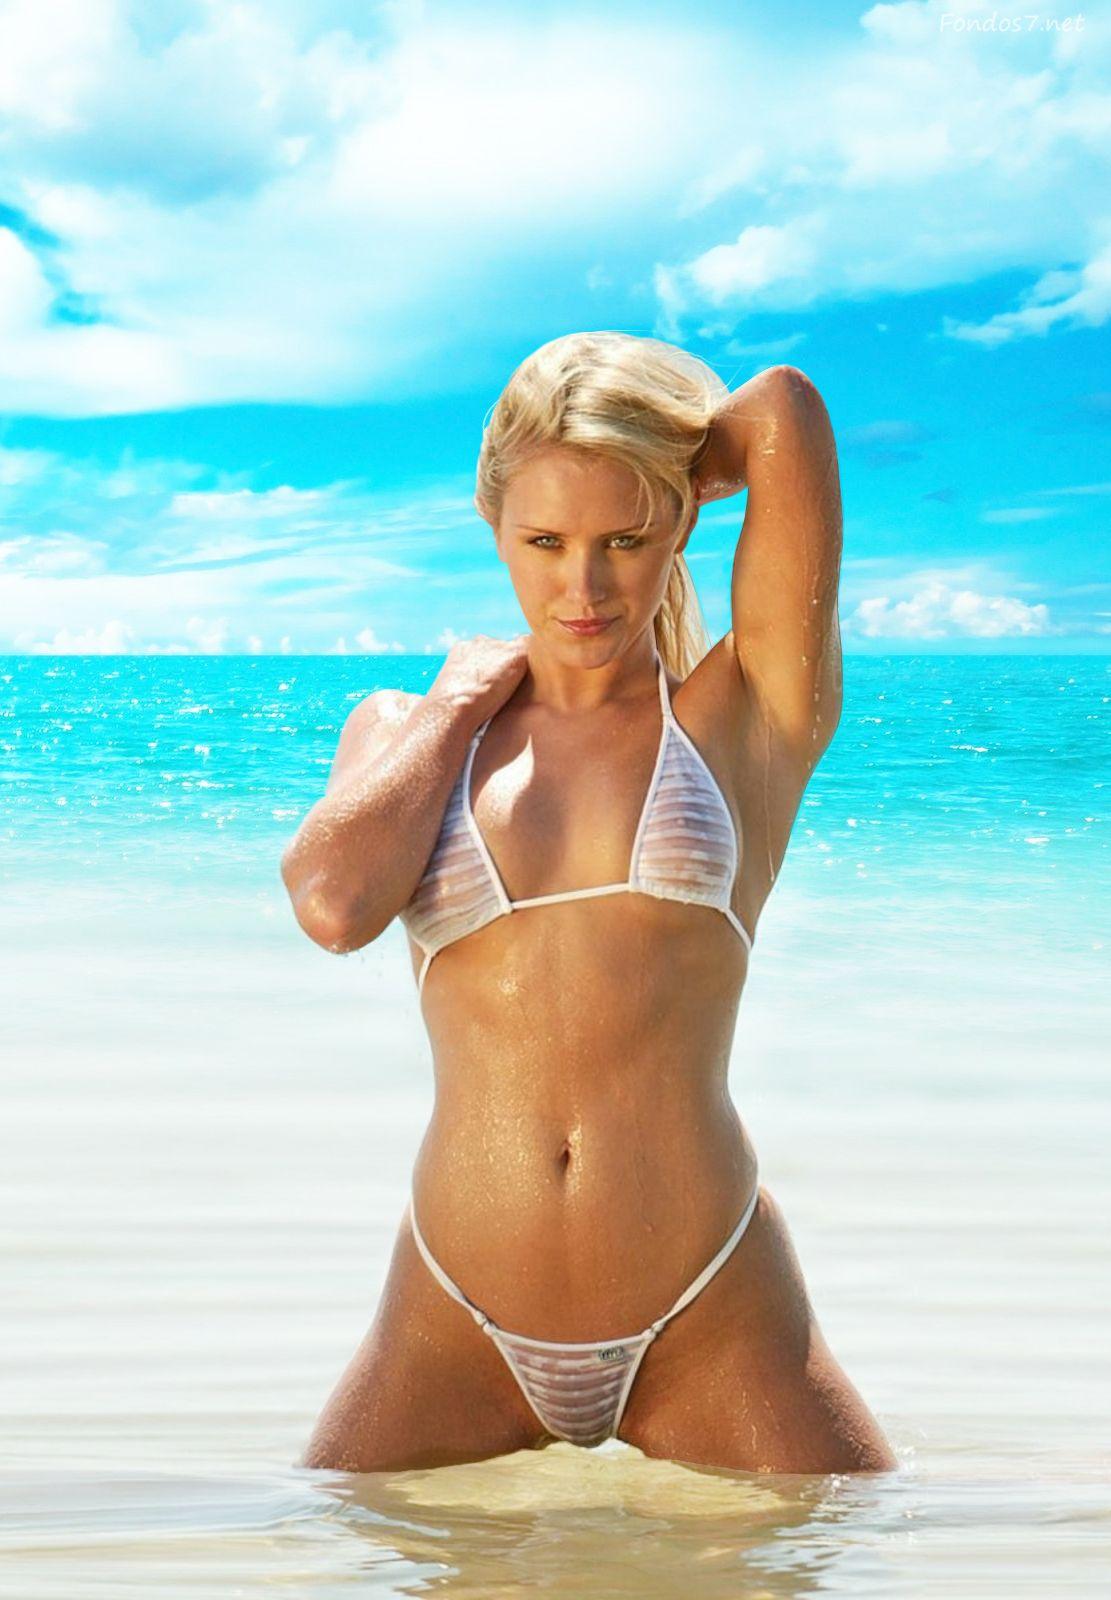 Bikini Nicky Whelan nudes (55 photo), Topless, Paparazzi, Selfie, braless 2015